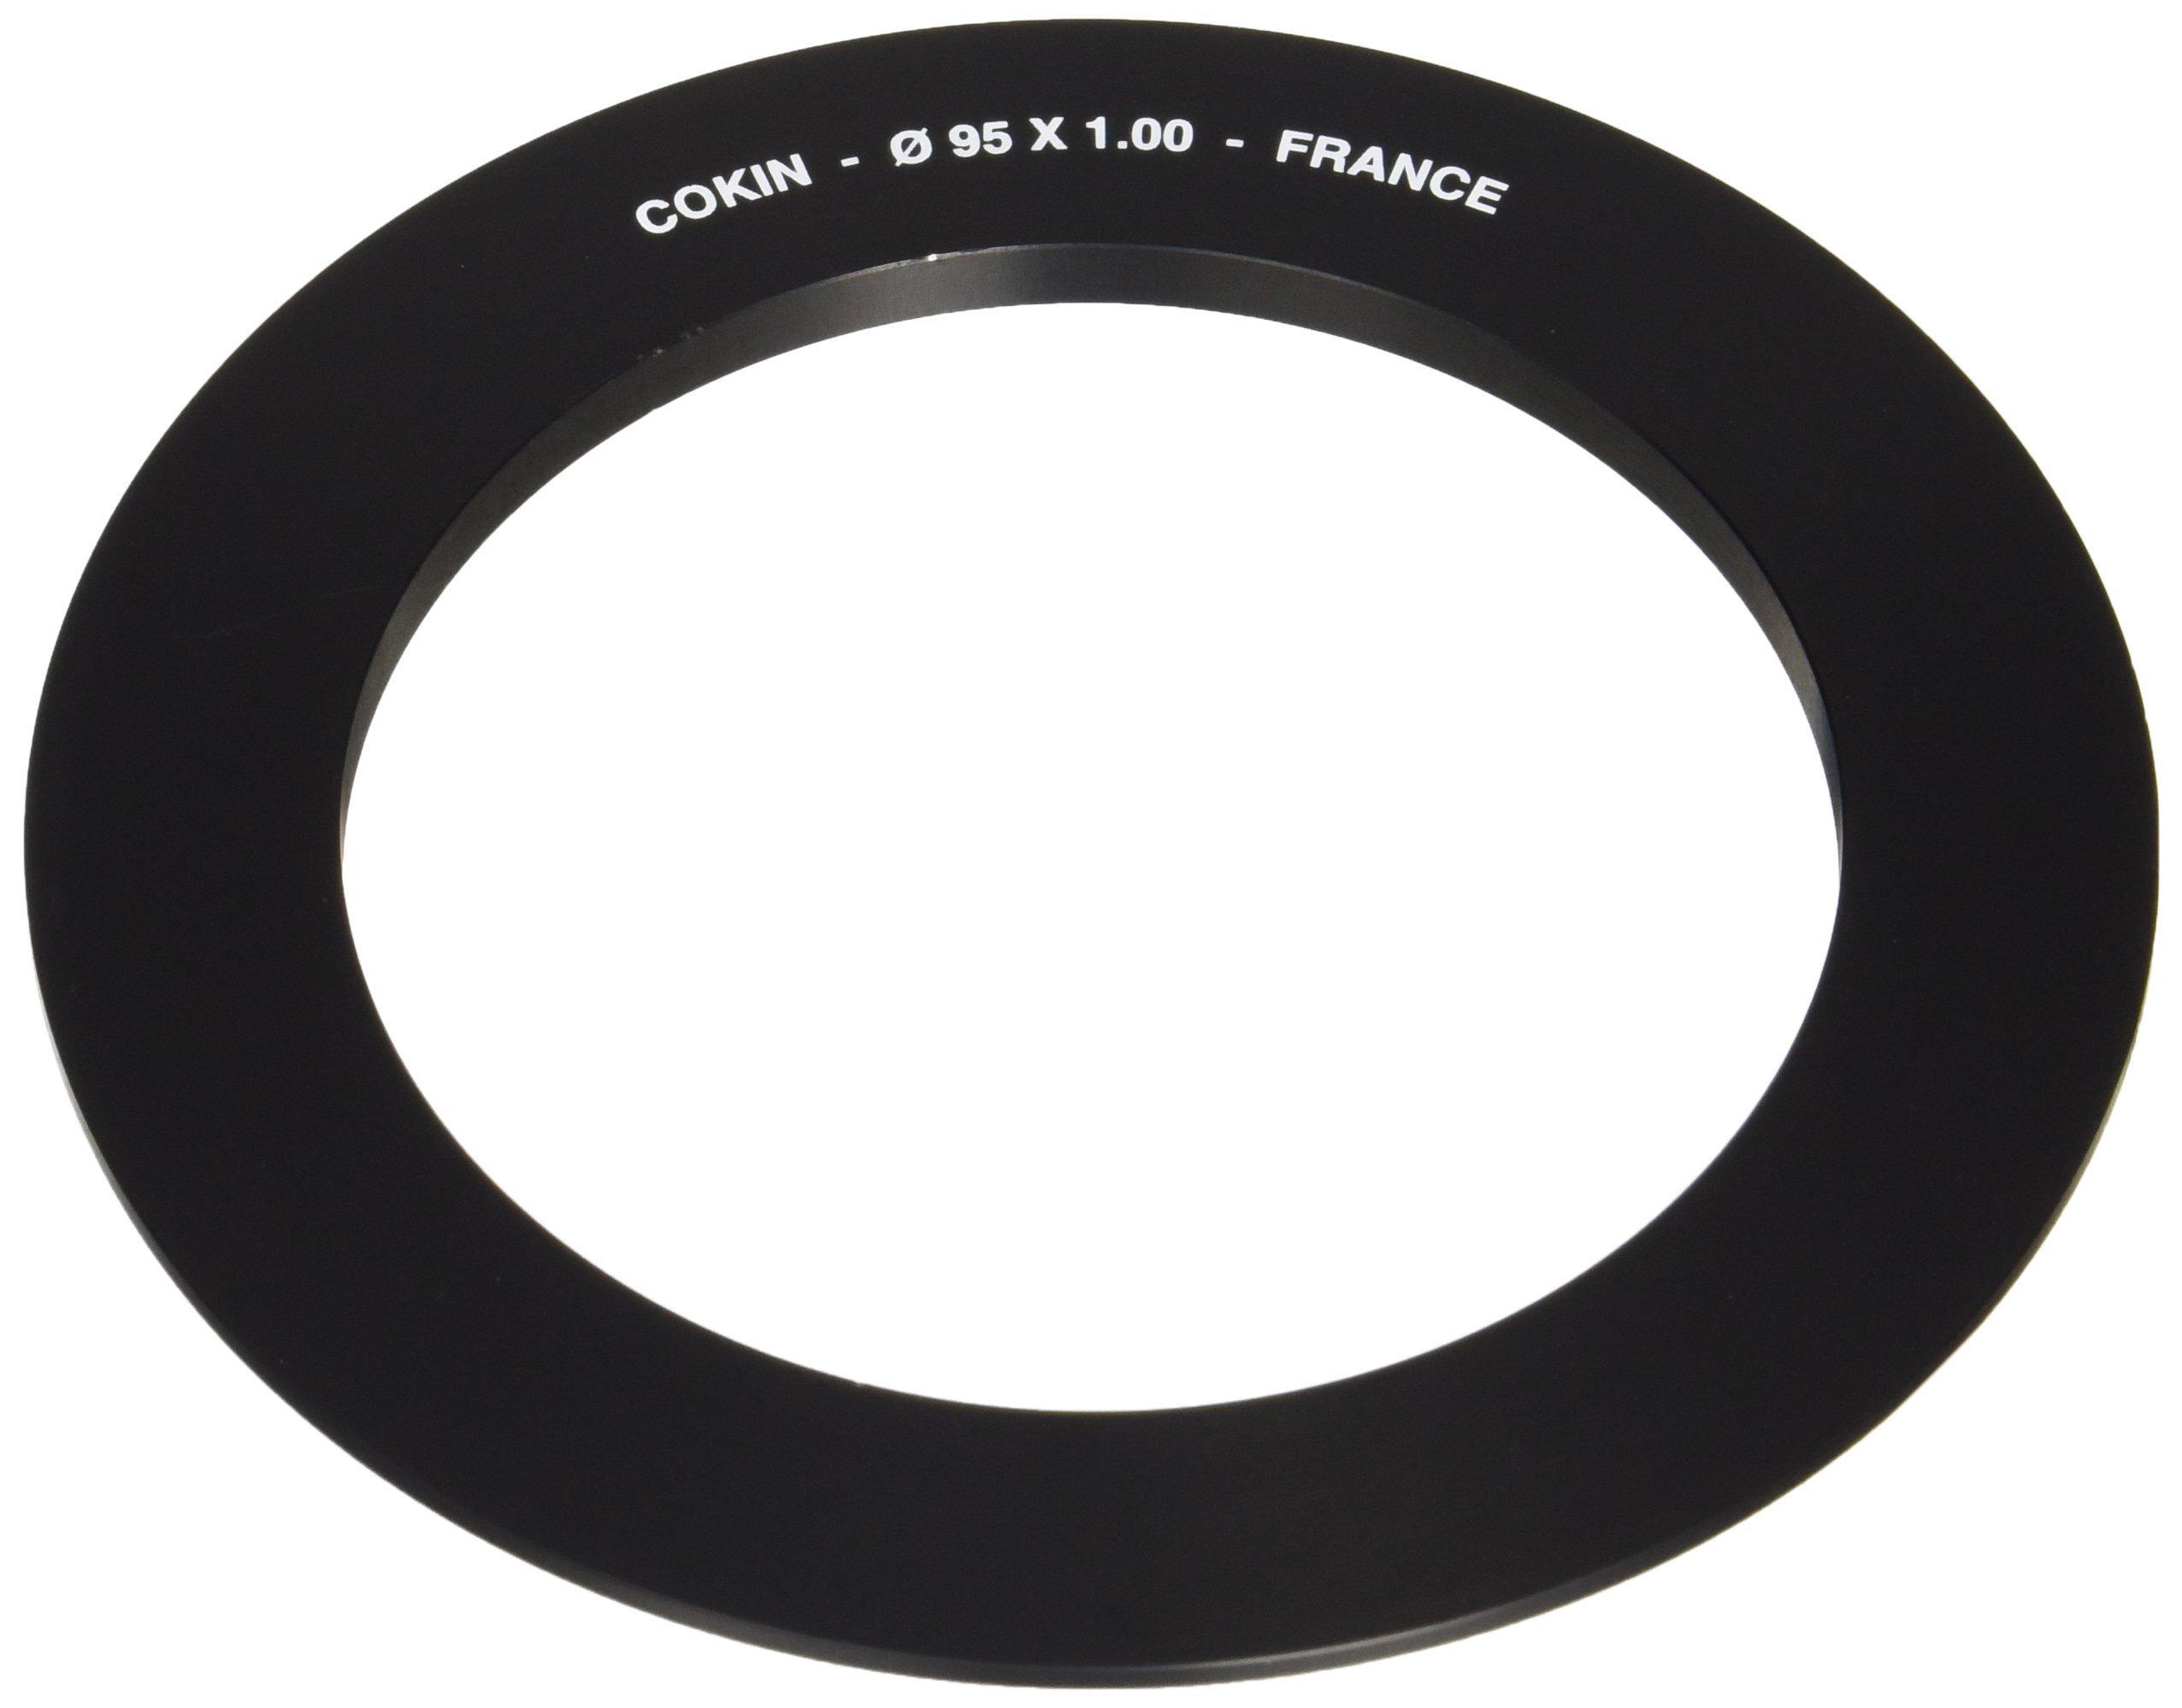 Cokin X495B Adapter Ring, X-pro, 95MM